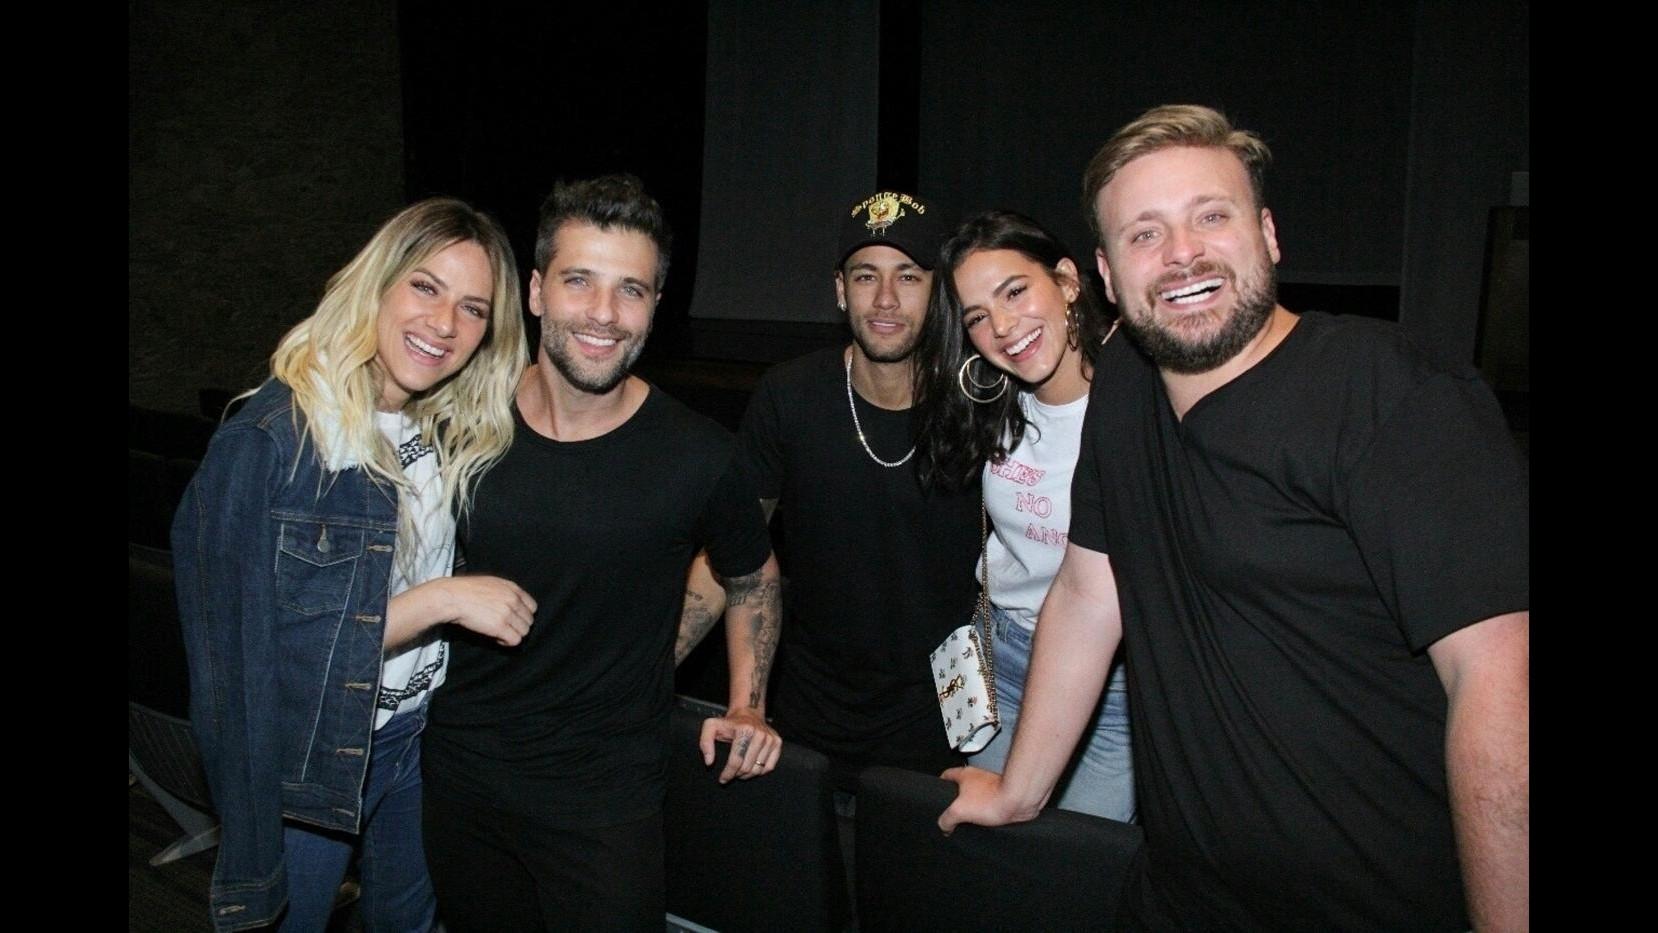 Neymar e i baci appassionati a Bruna Marquezine